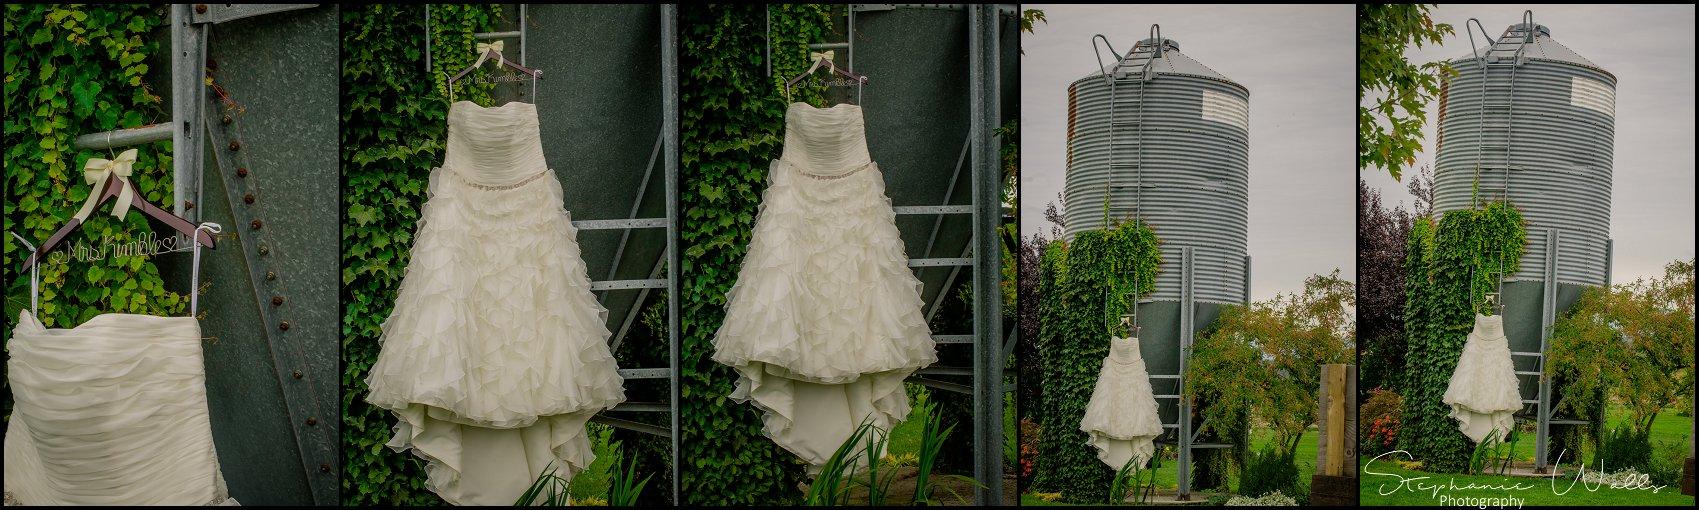 Kimble Wedding 020 Marlena & Allans | Snohomish Red Barn Events (Stocker Farms) | Snohomish, Wa Wedding Photographer